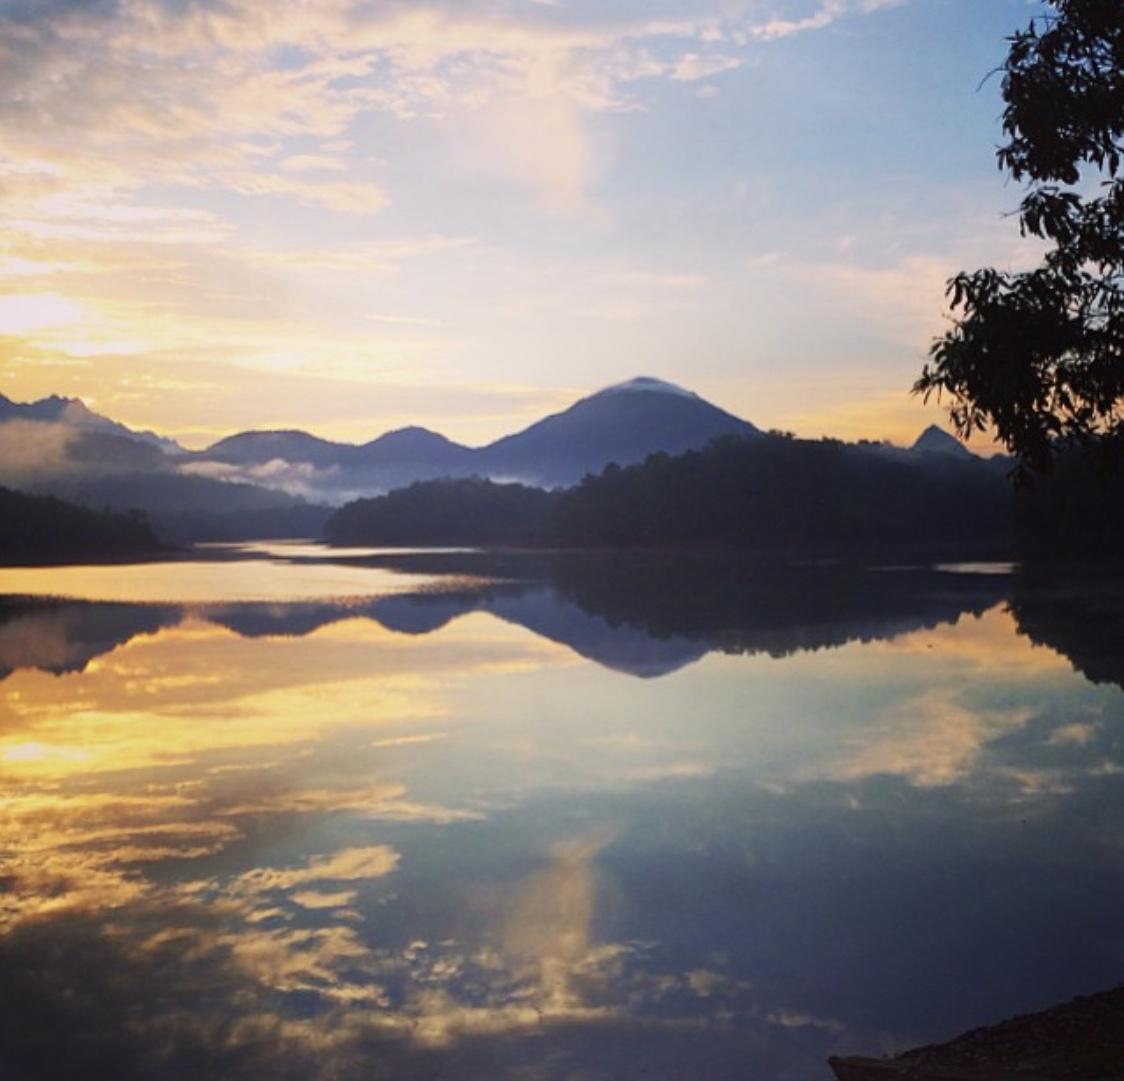 Kerala tourism - a landscape image of the neyarr dam region at sunrise